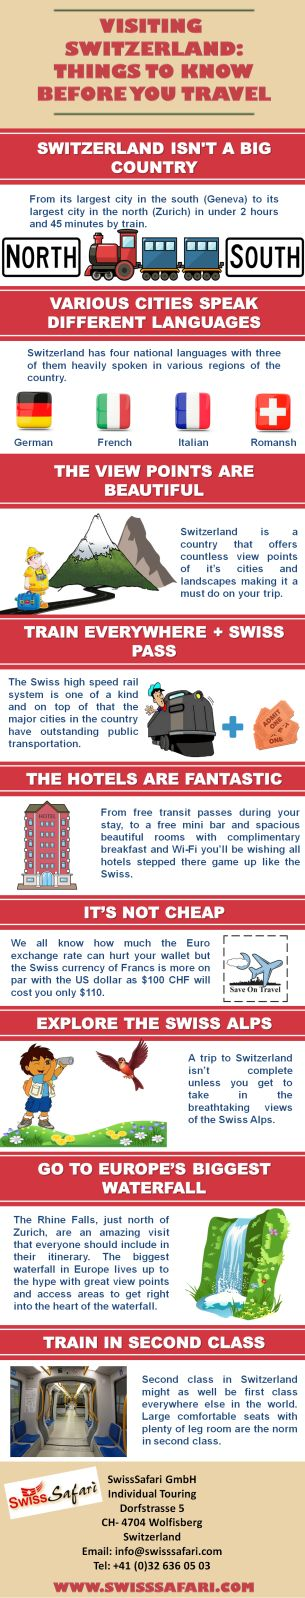 Twelve Days Exotic Escorted Switzerland Tour Plan